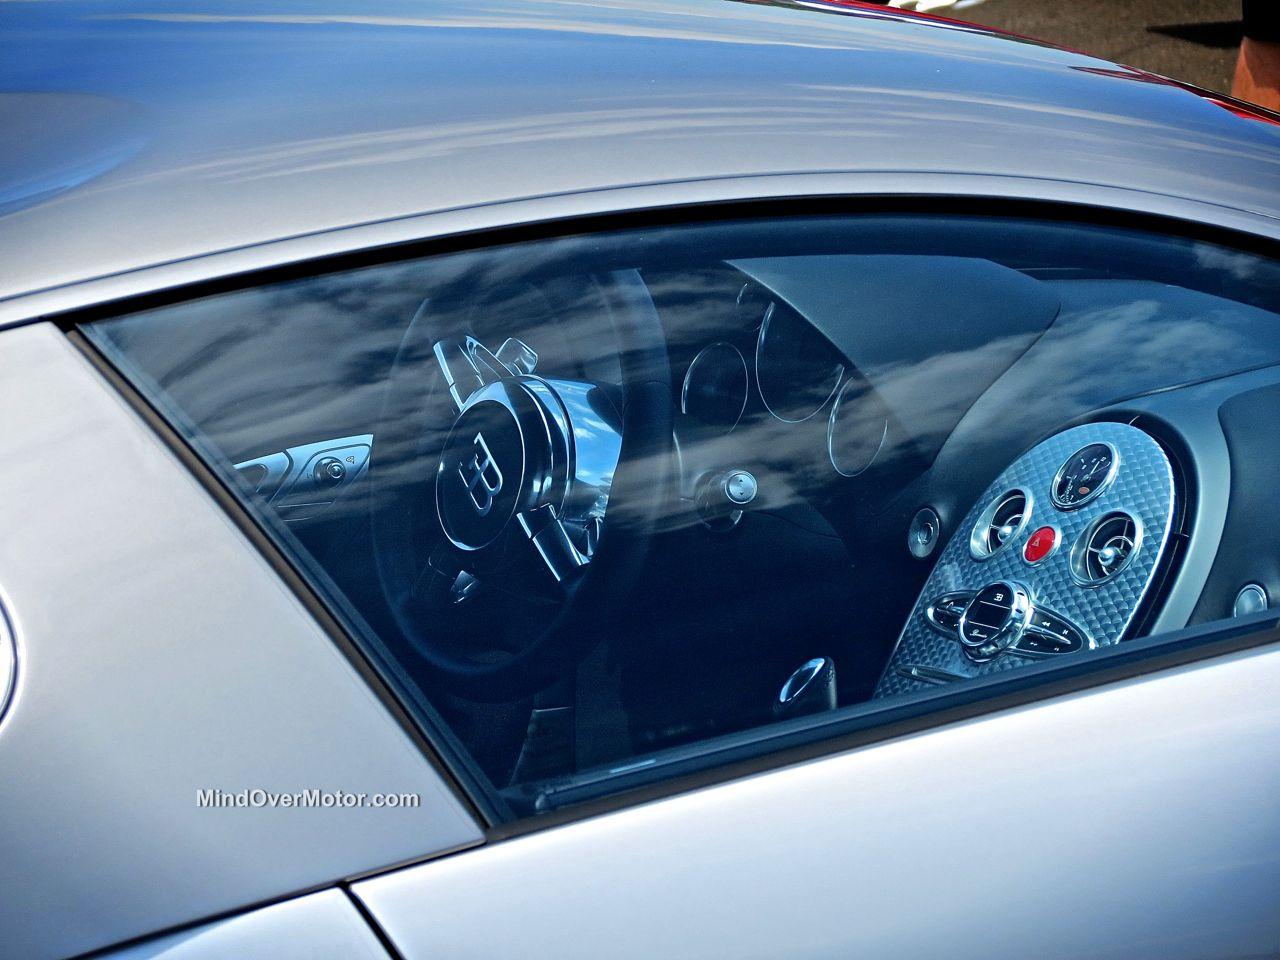 Bugatti Veyron Interior at CF Charities